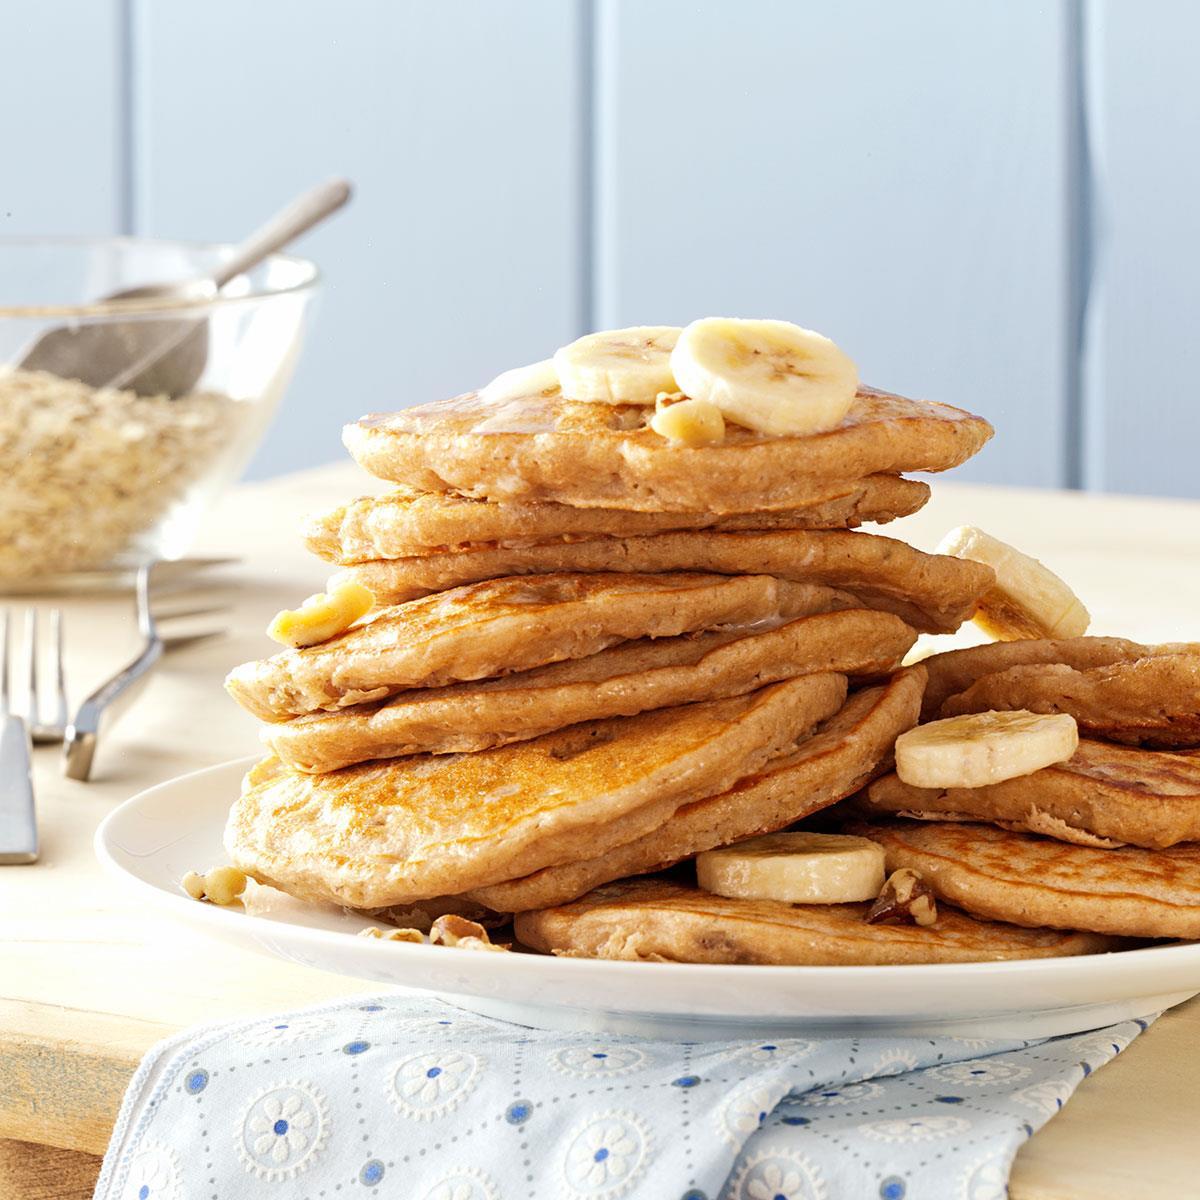 Banana Oatmeal Pancakes - By Madalena Vasconcelos